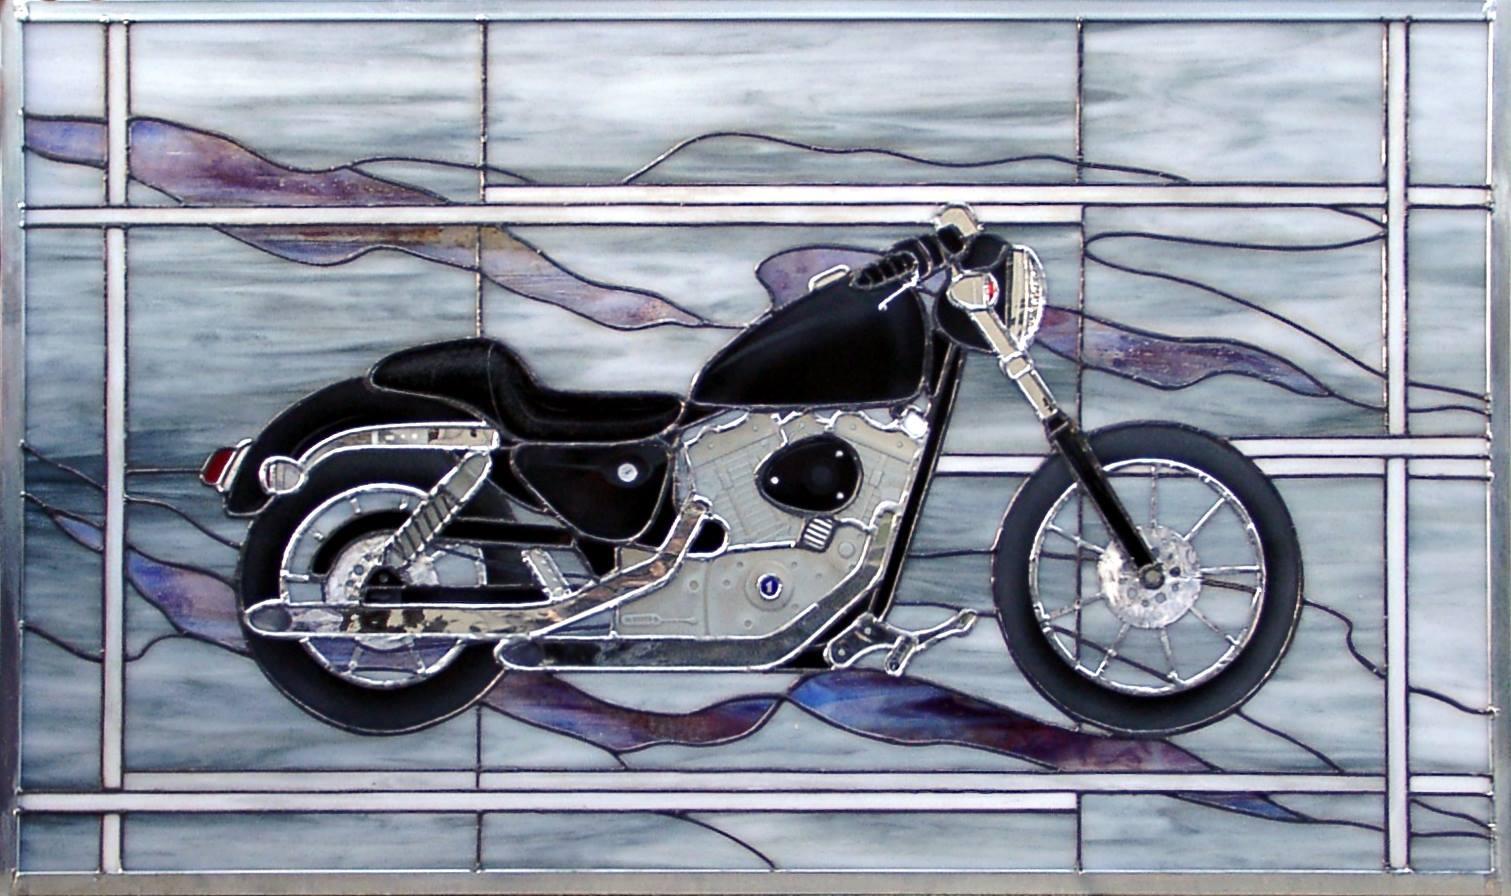 https://0201.nccdn.net/4_2/000/000/057/fca/Harley-Davidson-1511x896.jpg